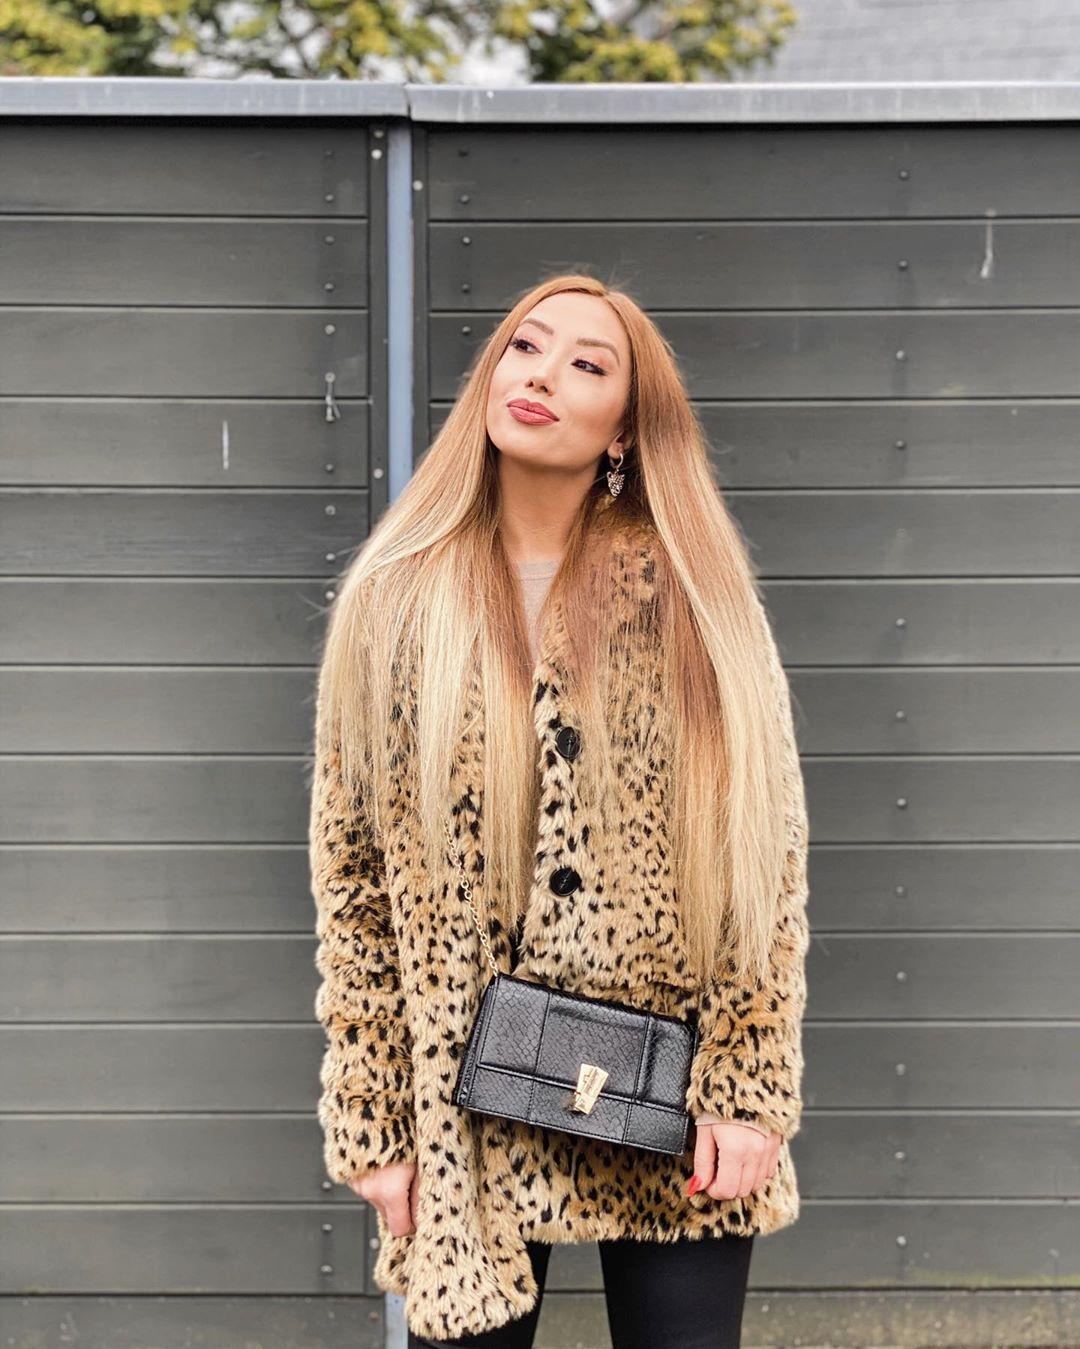 Ne bileyim sen öyle bakınca bende iyi ki varım sandım  .... #beauty #makeup #love #fashion #beautiful #skincare #photography #style #like #instagood #model #follow #photooftheday #hair #makeupartist #art #nature #mua #instagram #cute #lashes #girl #nails #cosmetics #picoftheday #skin #photo #happy #lifestyle #bhfyp